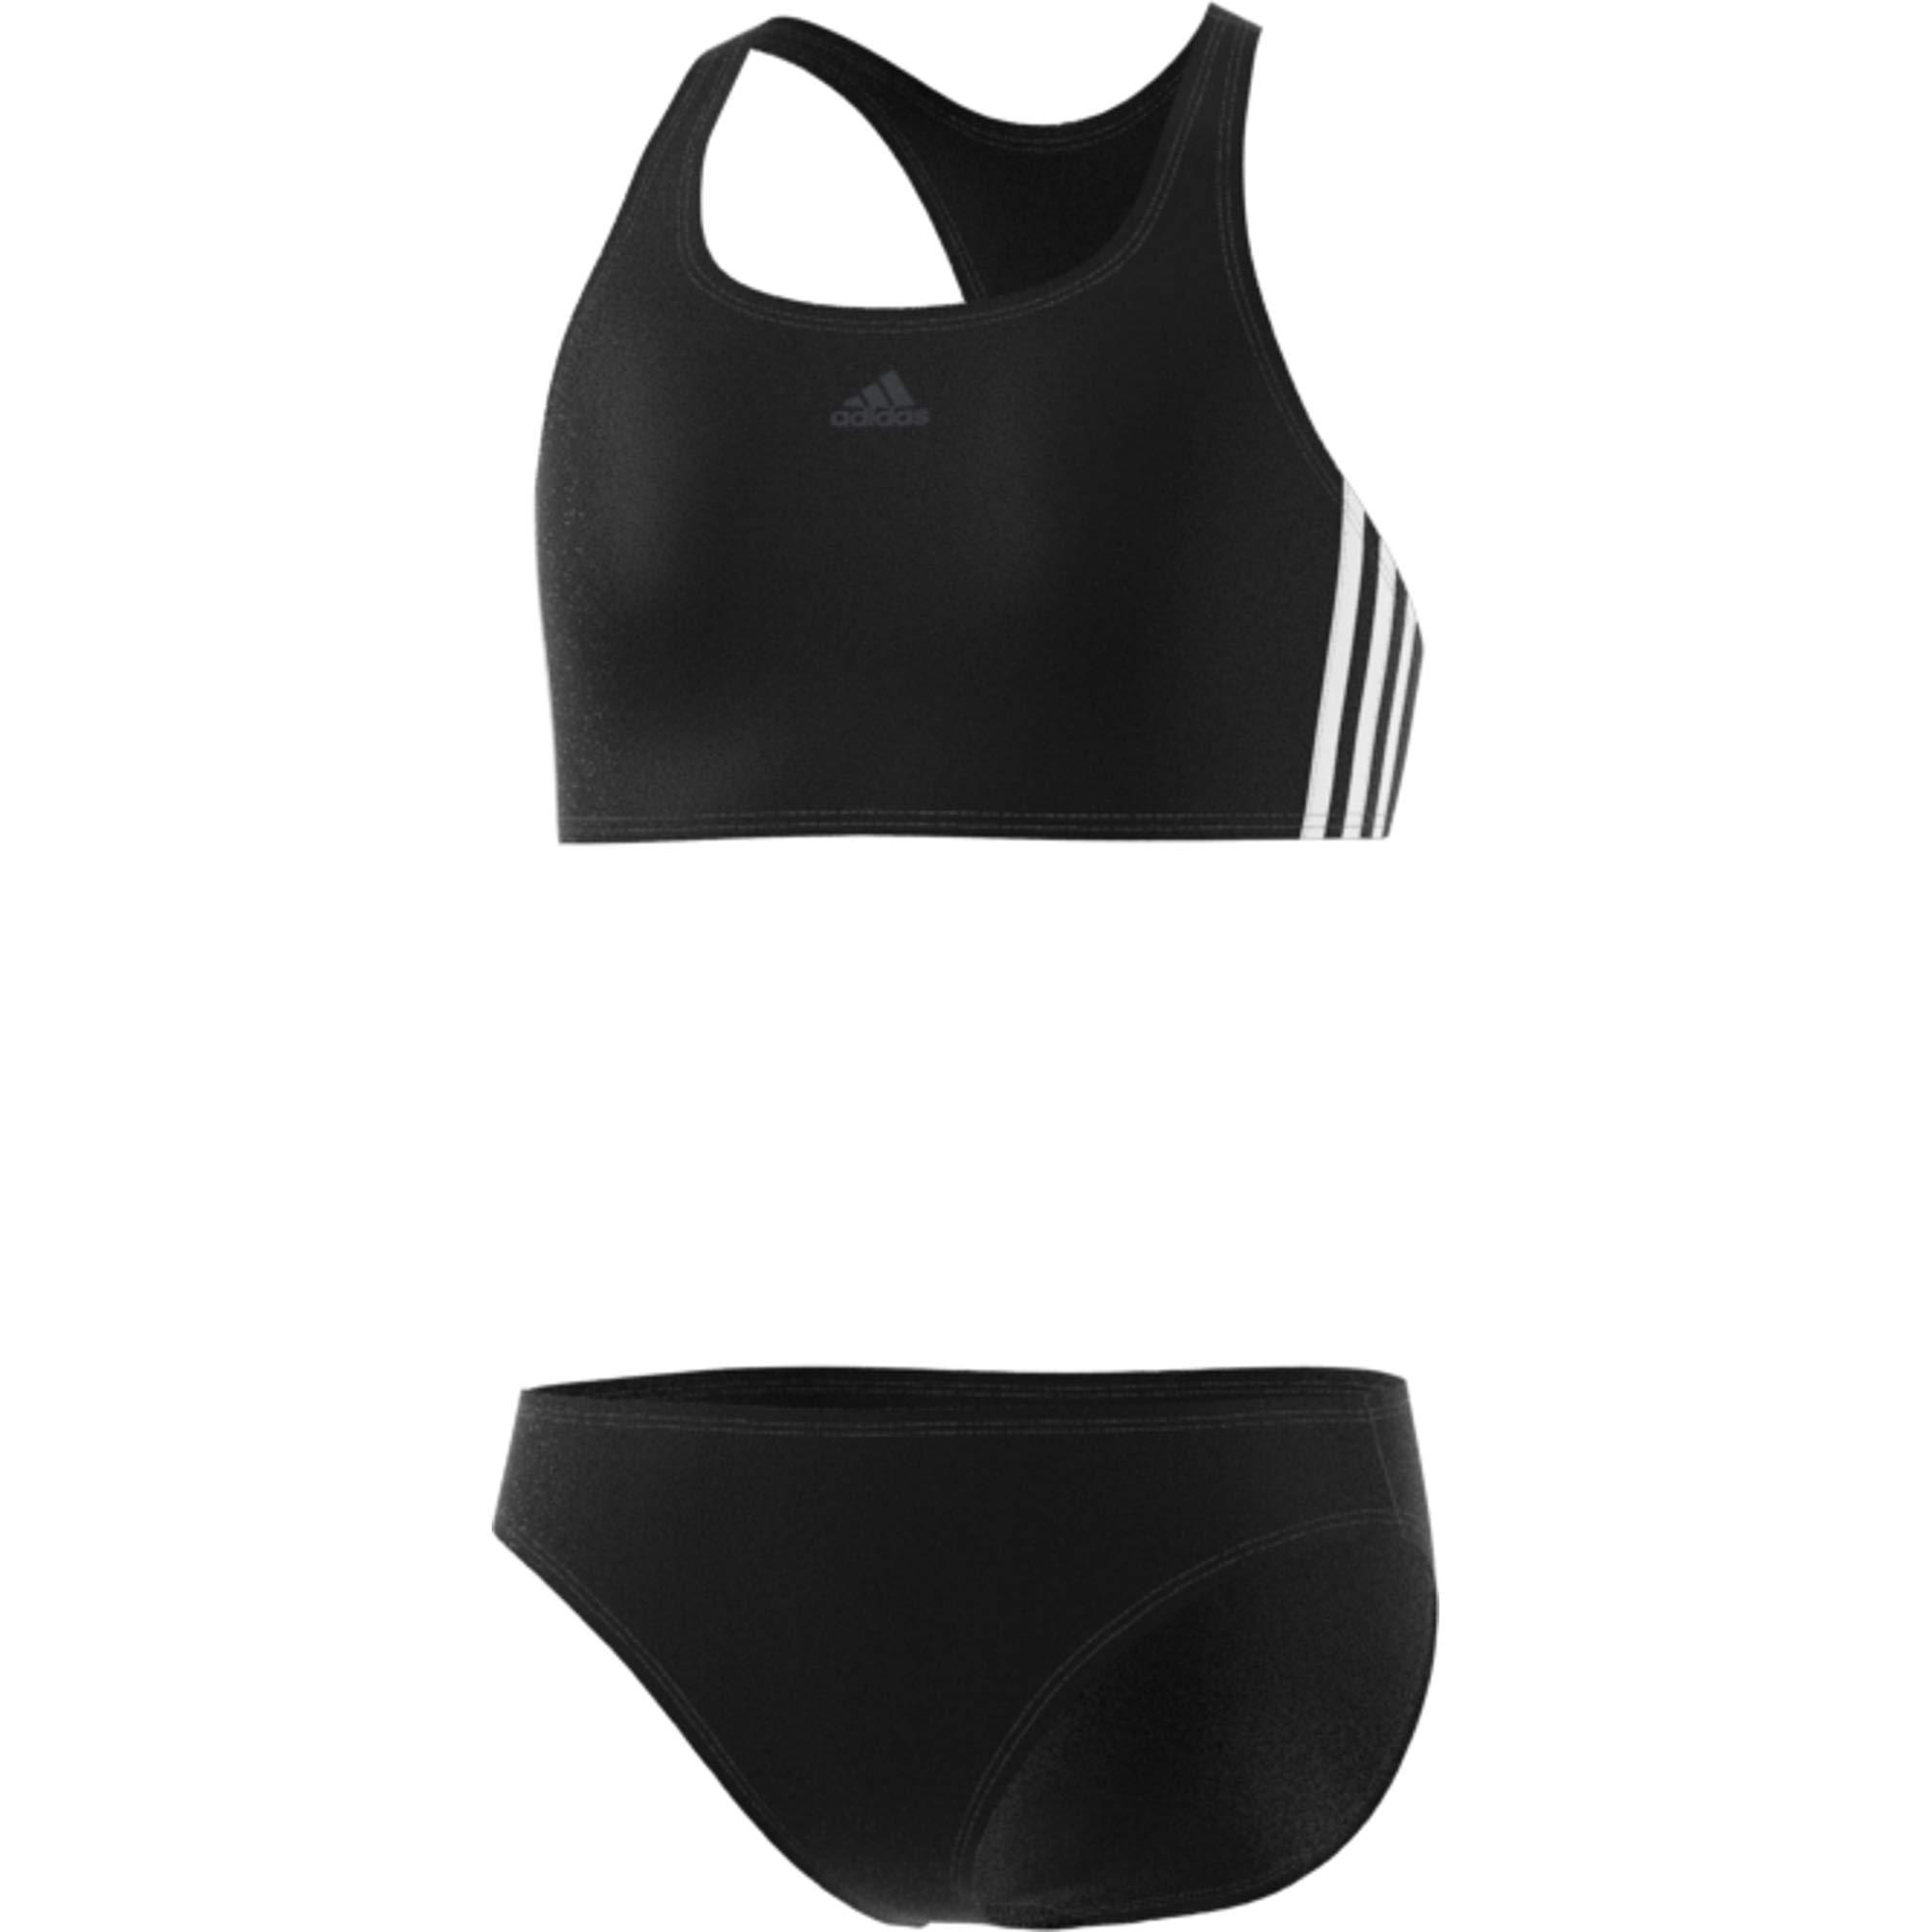 a0bbf555f7c9 adidas Fitness 3 Stripes Bikini Girls, Swimwear Bambina - Face Shop